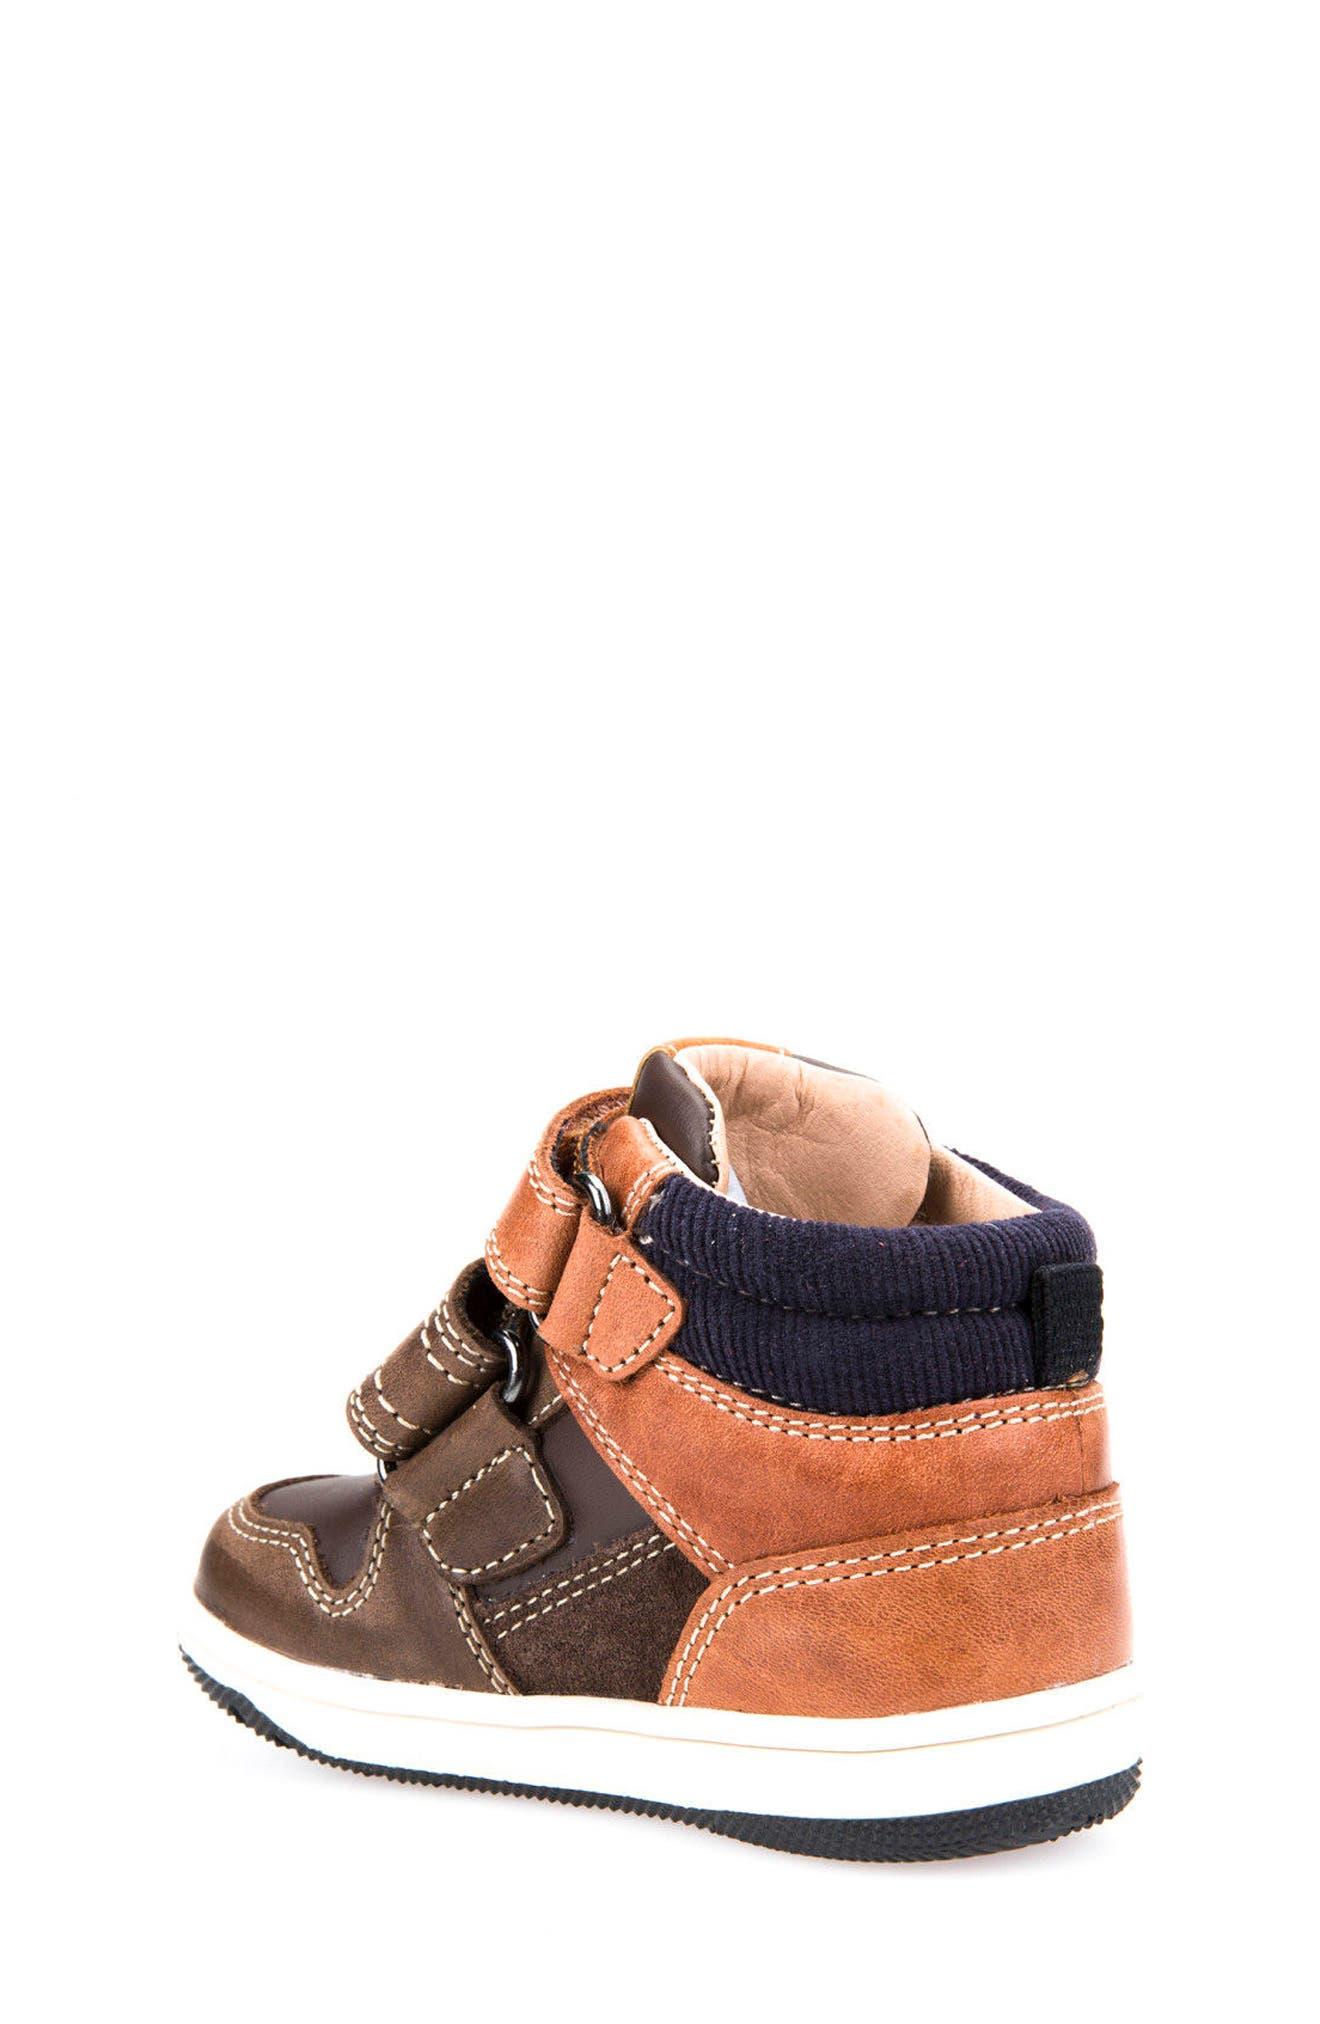 Alternate Image 2  - Geox New Flick Mid Top Sneaker (Walker & Toddler)